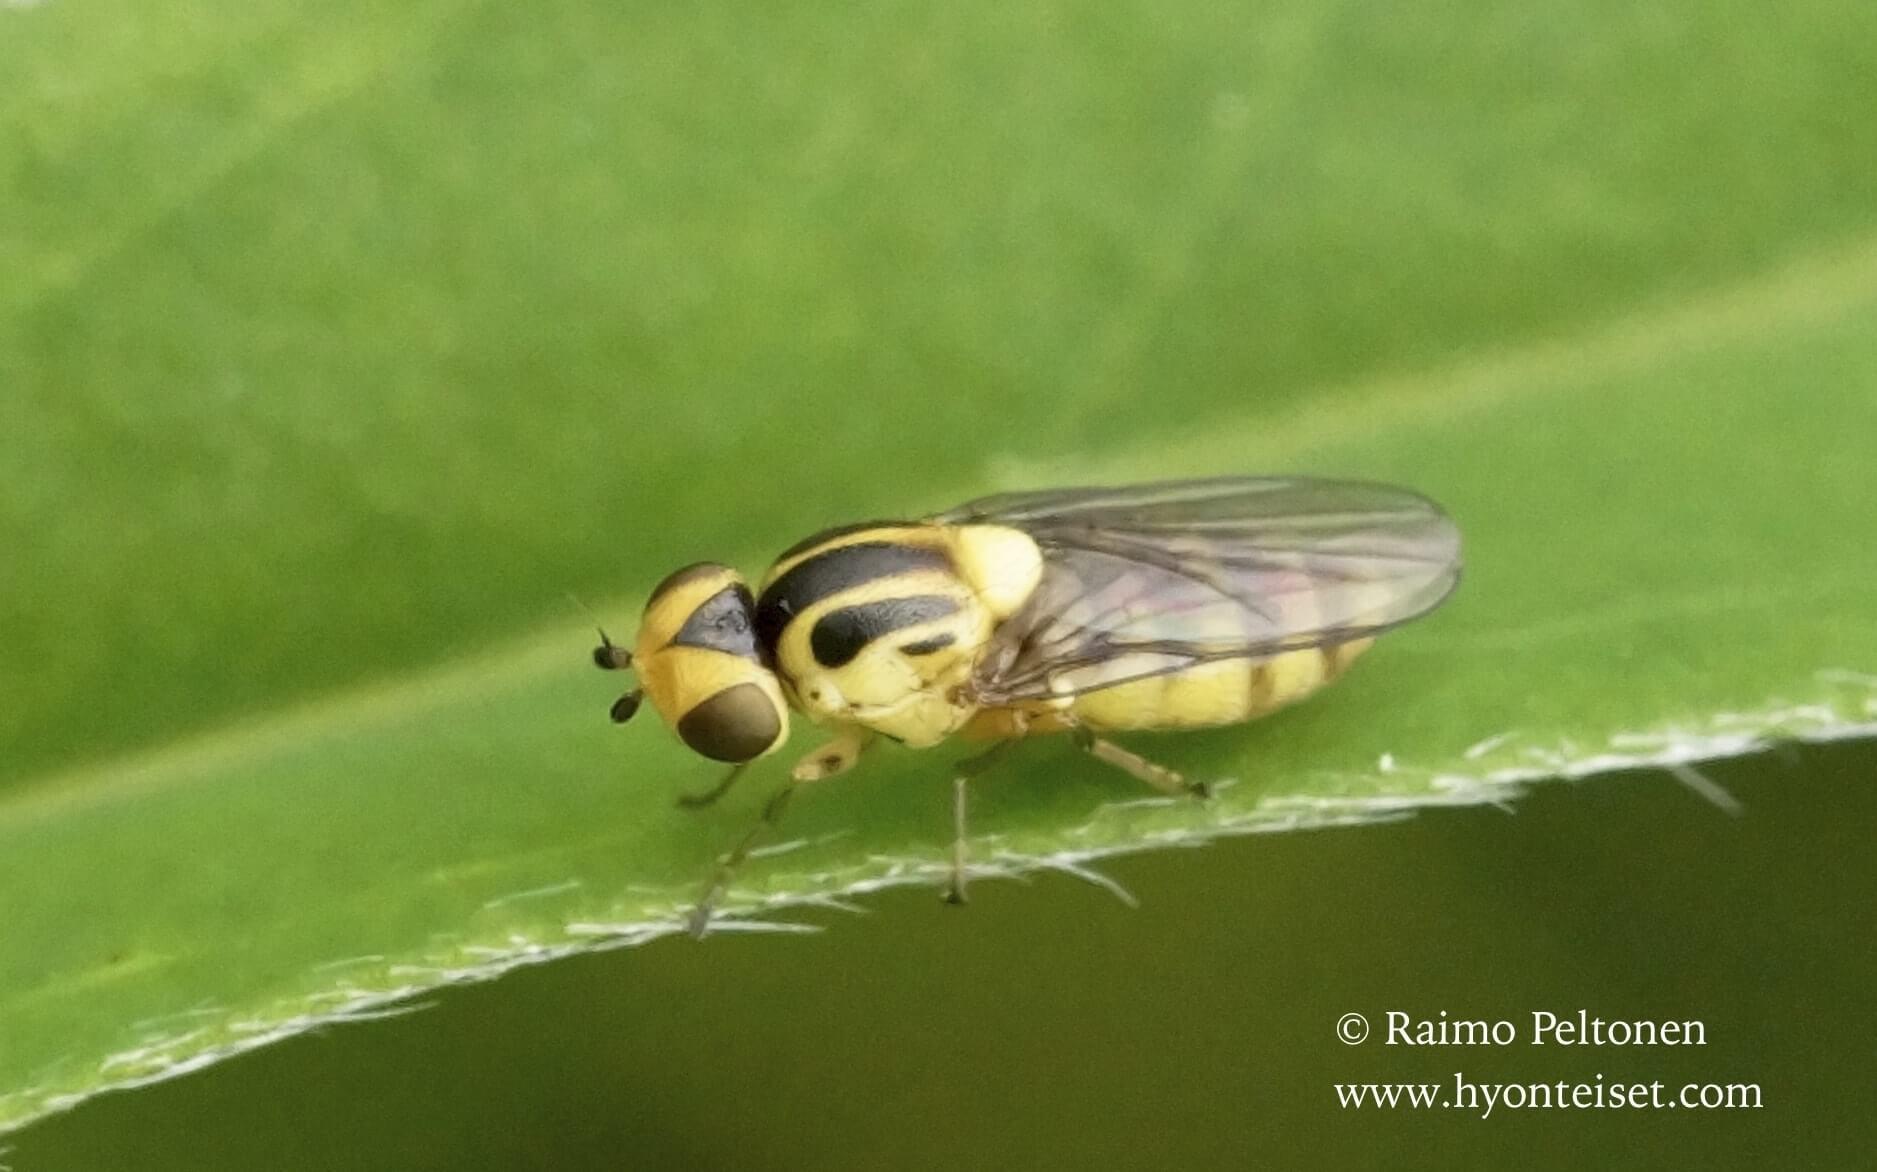 Chlorops sp. (det. Paul Beuk)